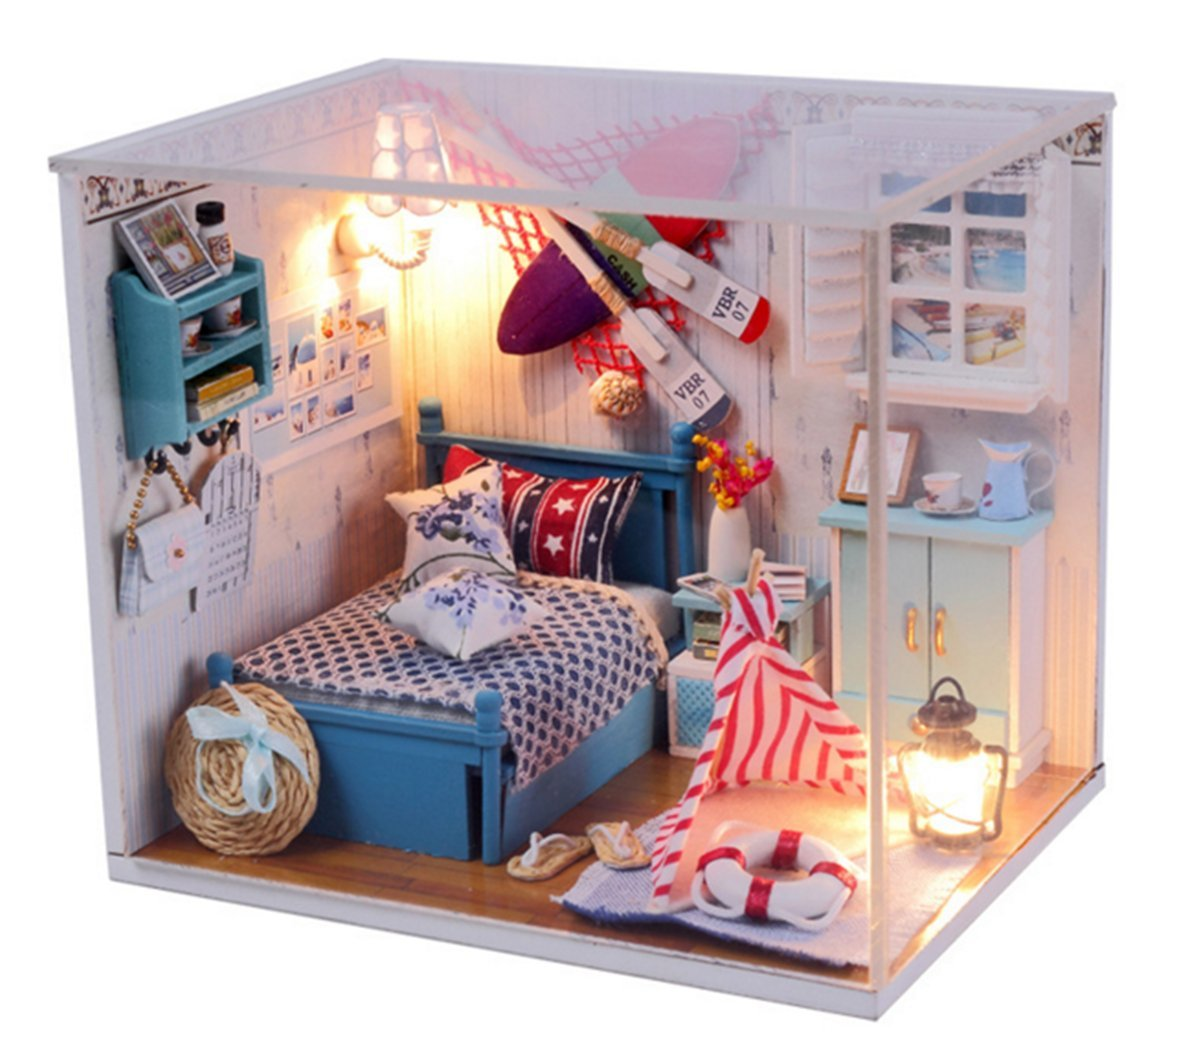 Amazoncom Wind Dollhouse Miniature DIY Dream House